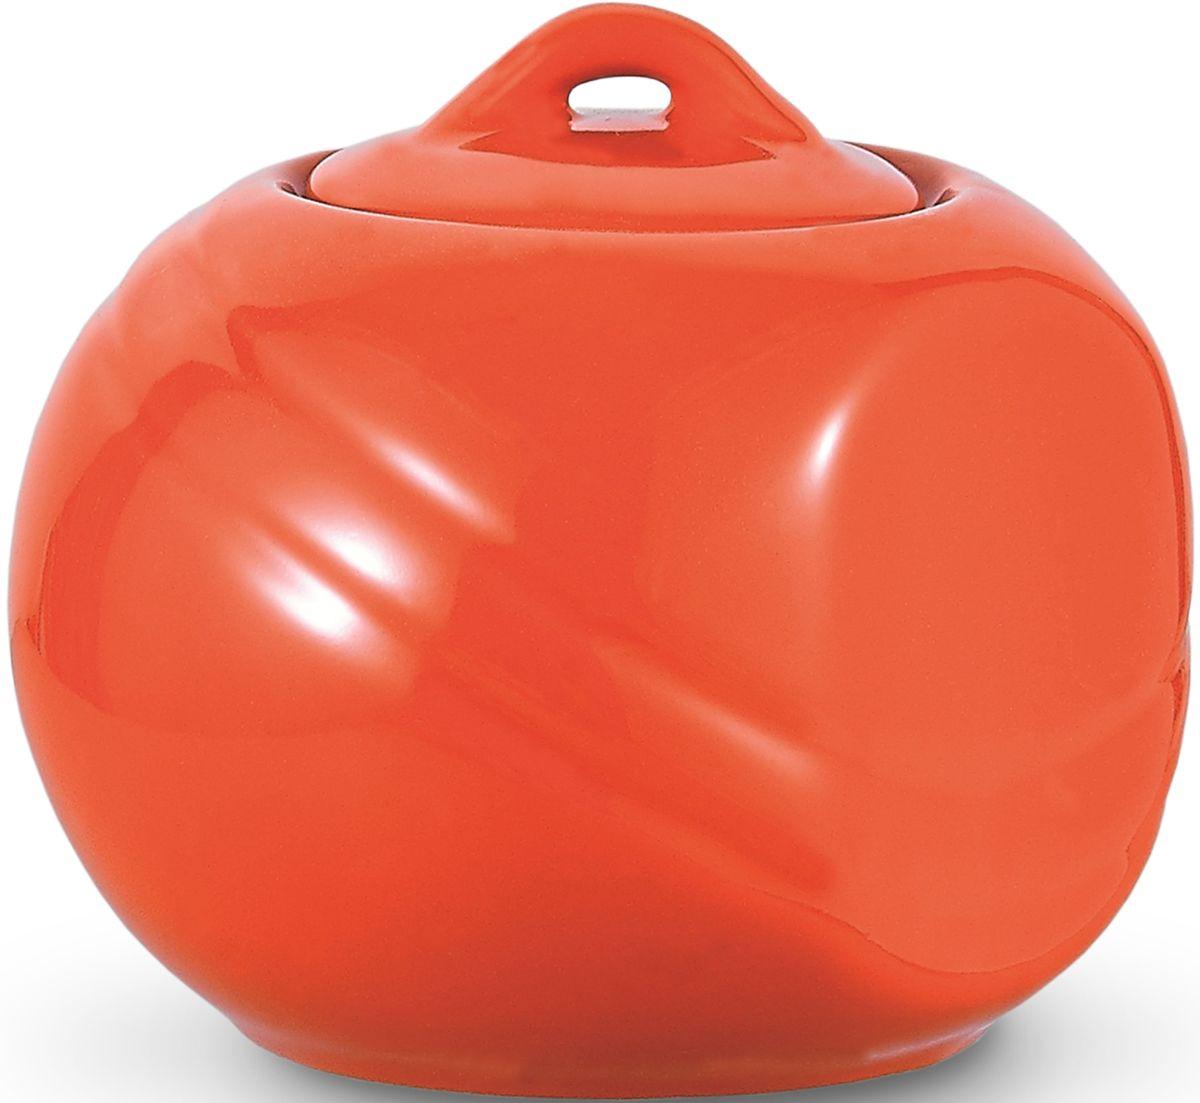 Сахарница Fissman, цвет: оранжевый, 350 мл. 9280SB-9280.350